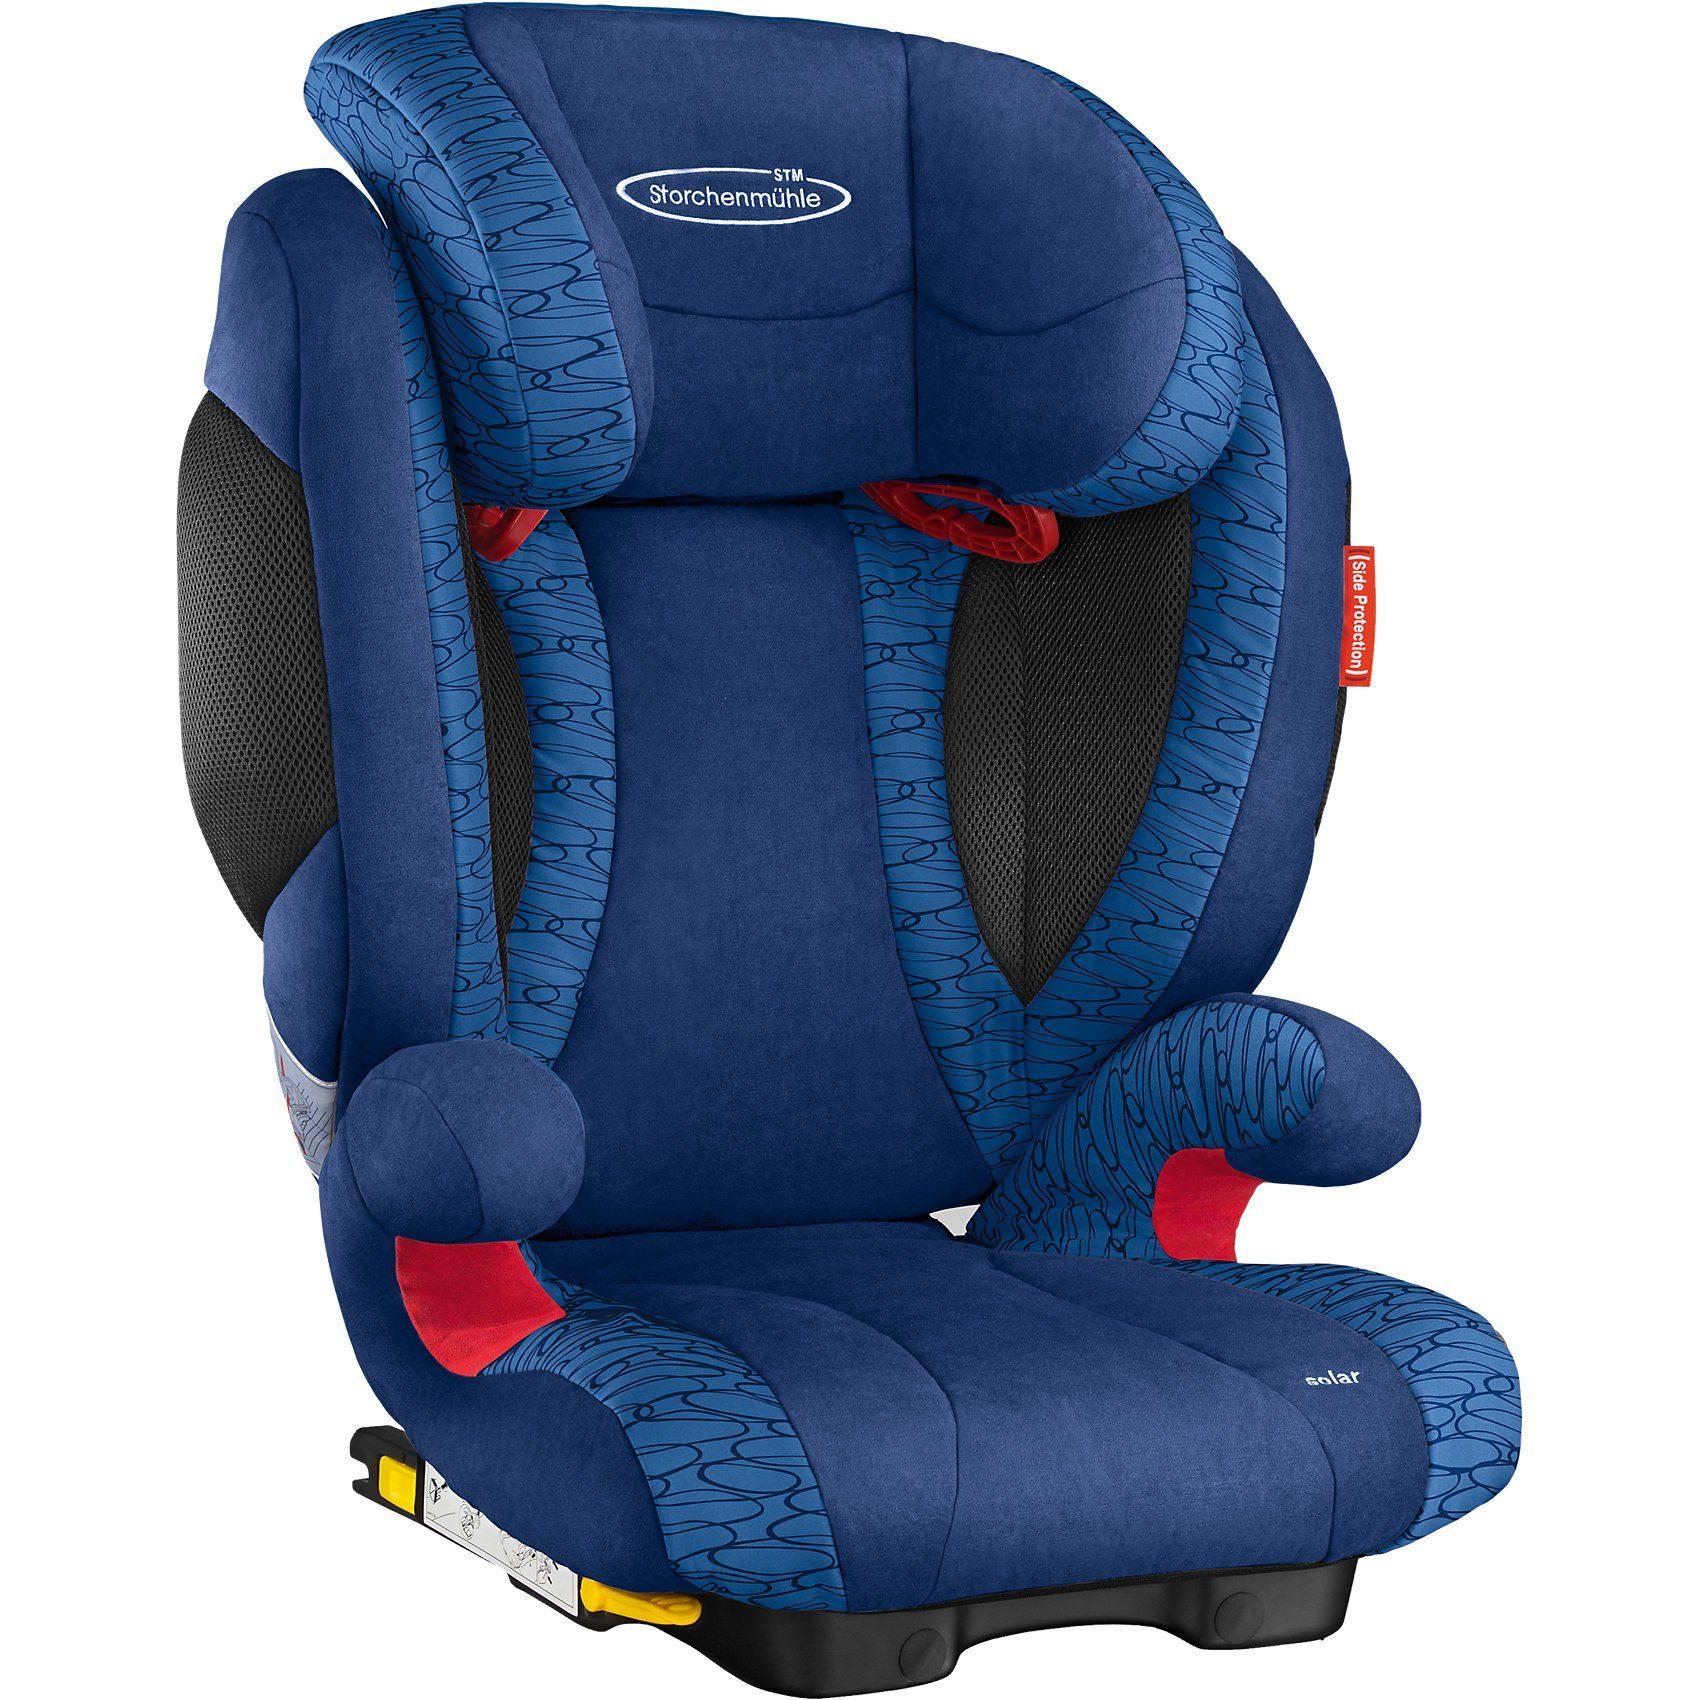 Storchenmühle Auto-Kindersitz Solar 2 Seatfix, Navy